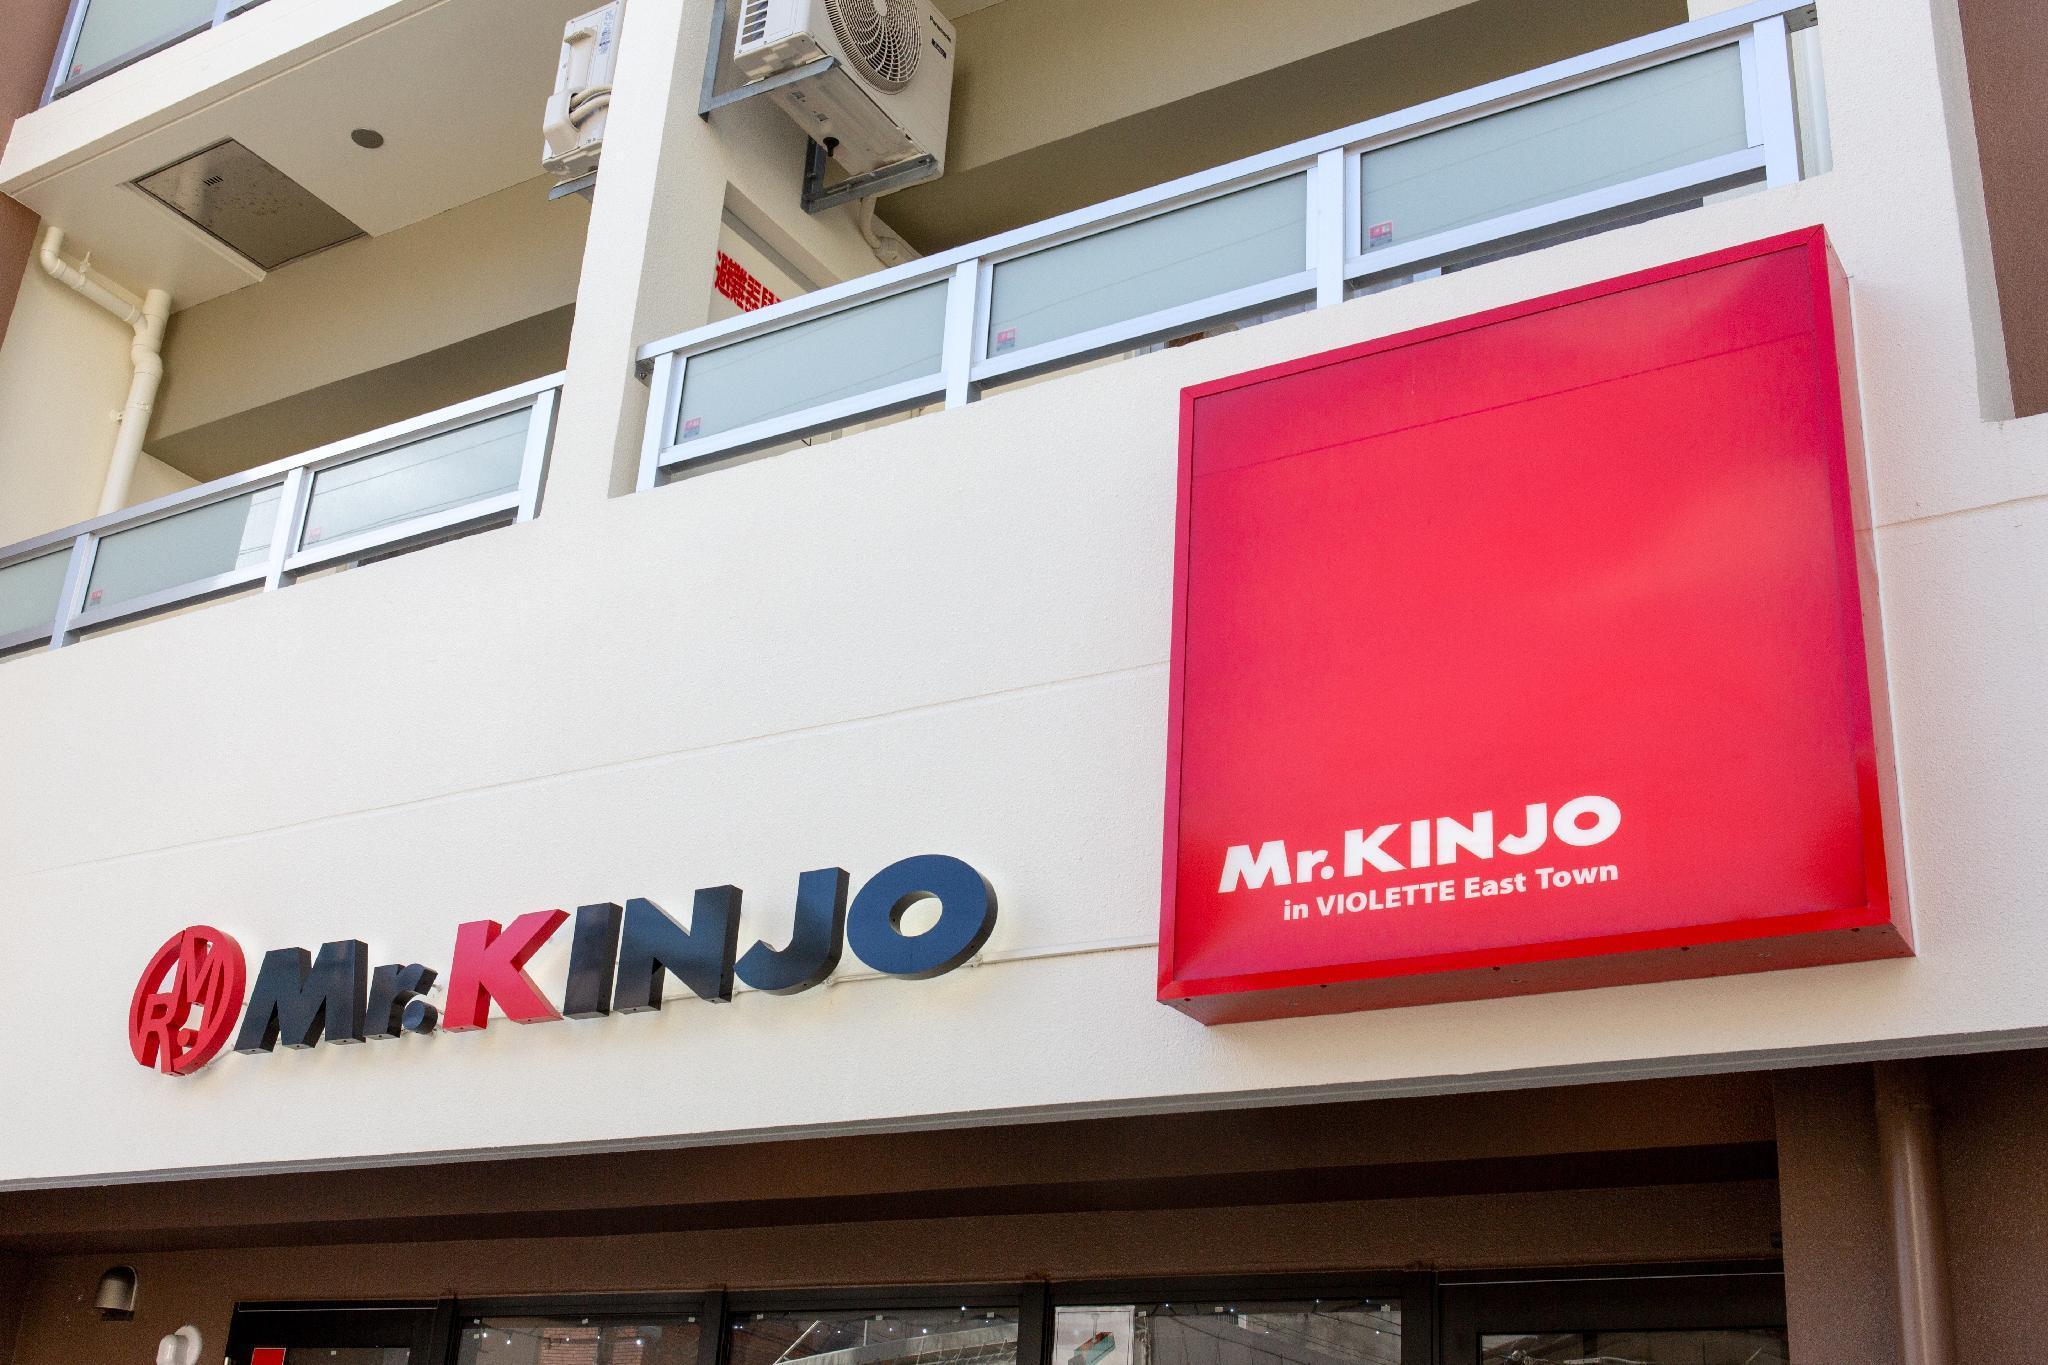 Mr.KINJO In VIOLETTE East Town